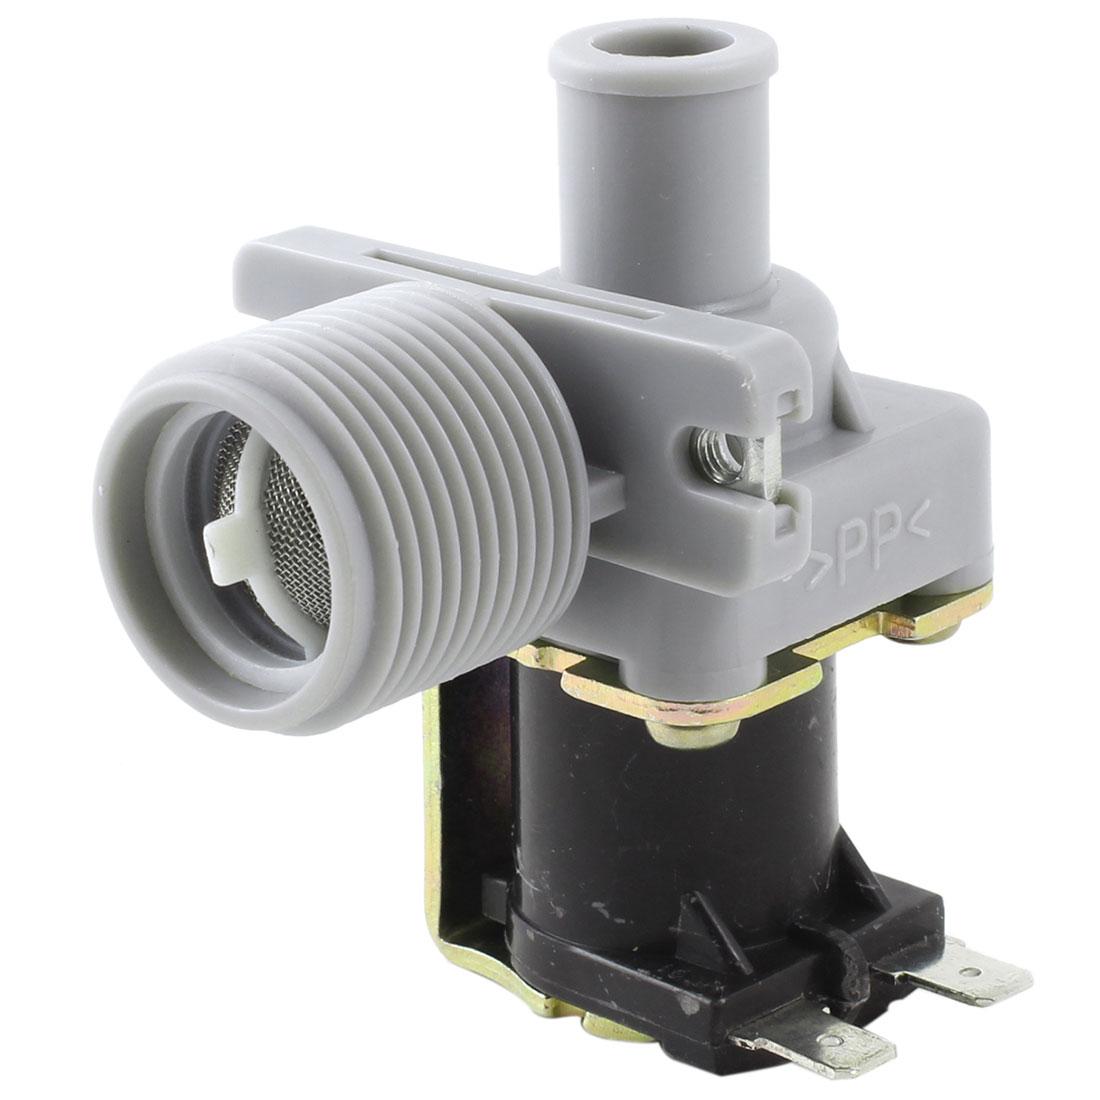 AC 220-240V 50/60Hz Water Inlet Solenoid Valve for LG Washing Machine Washer